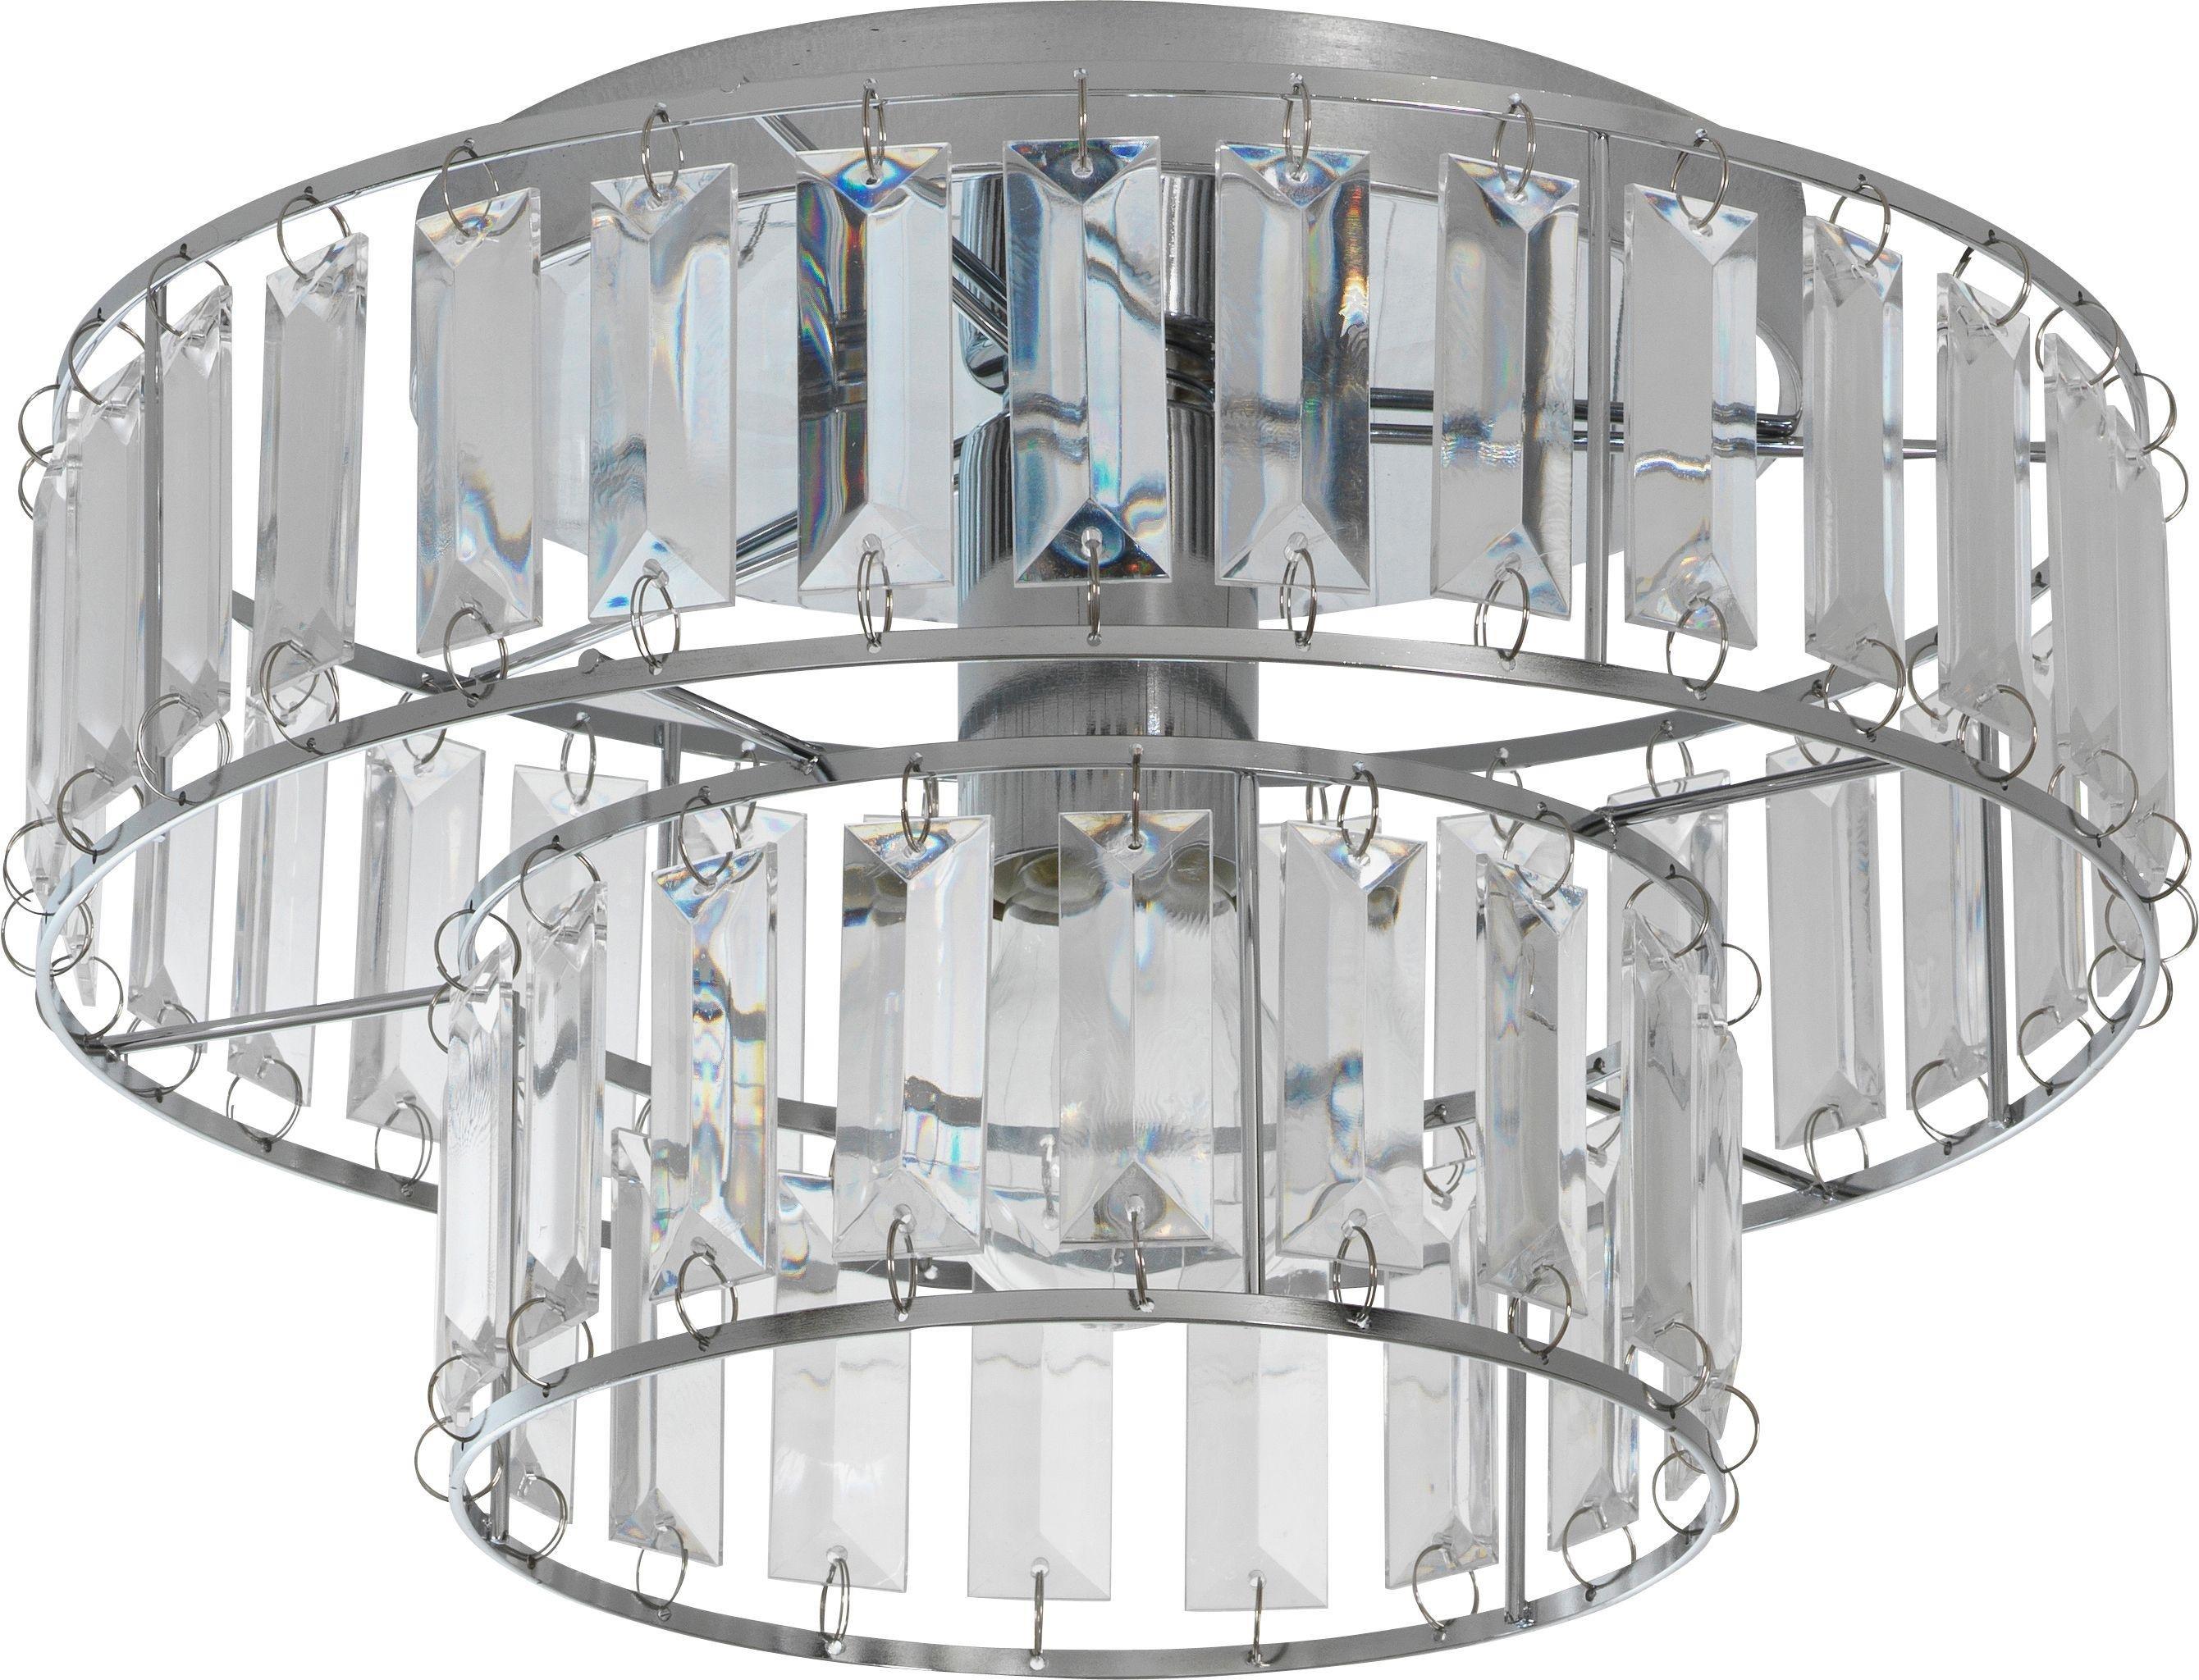 Argos Home Gisela 2 Tier Glass Ceiling Fitting - Chrome